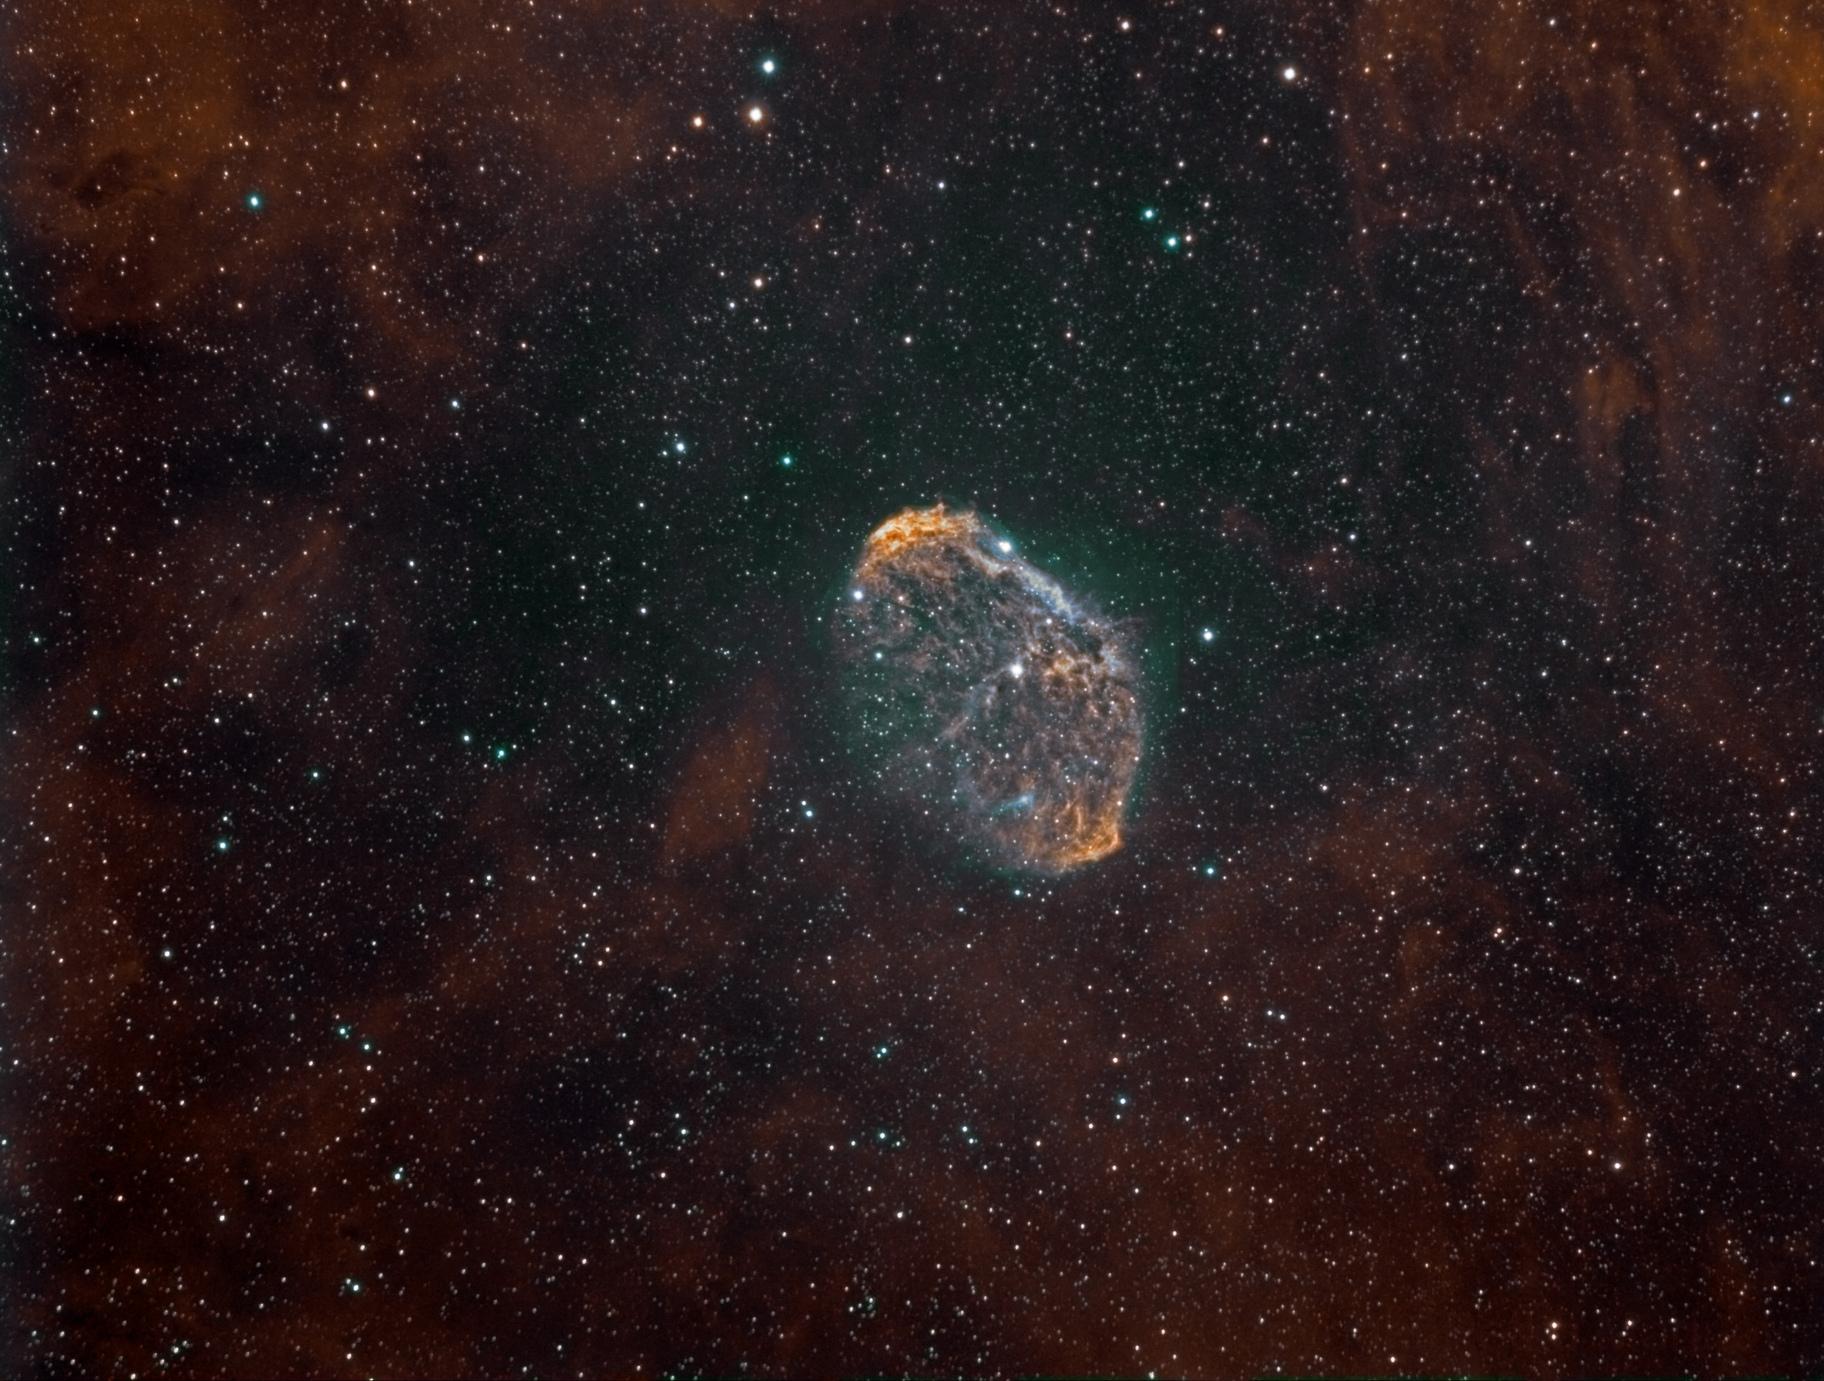 5a076f0924f1a_NGC6888ensho.jpg.04ce84b299569dac11efb3f4c0869108.jpg